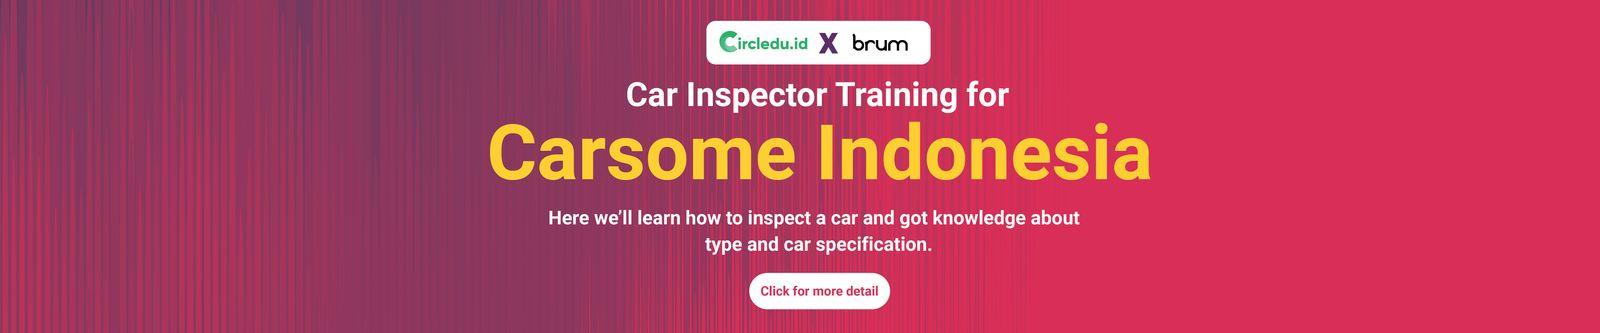 car-inspector